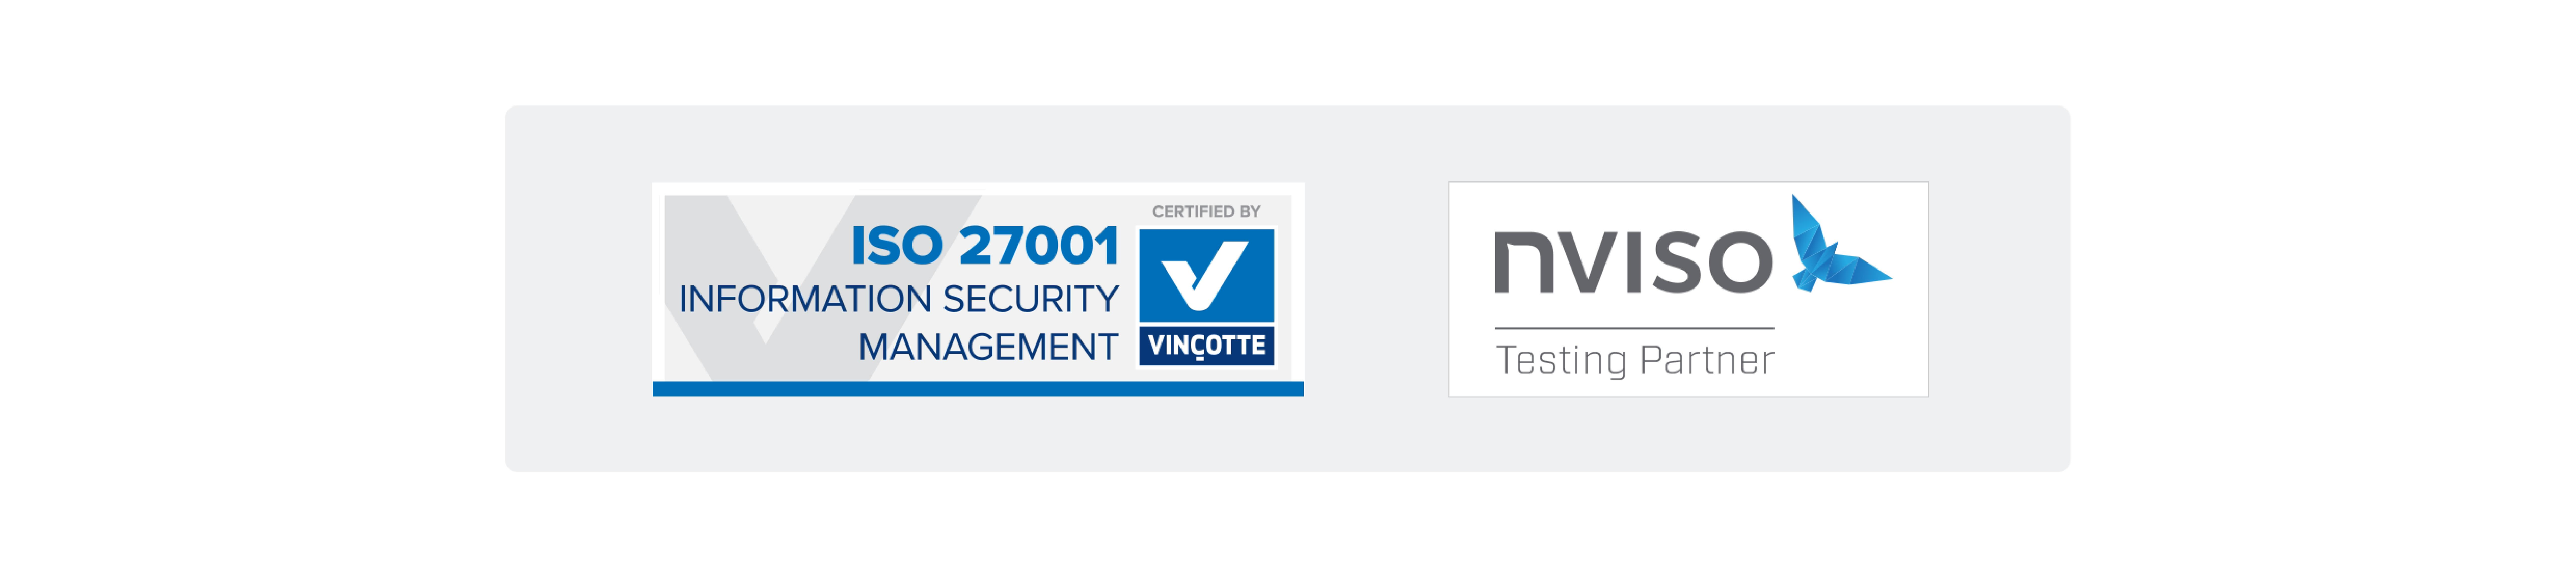 ISO logo-IEC no logo-NVISO logo